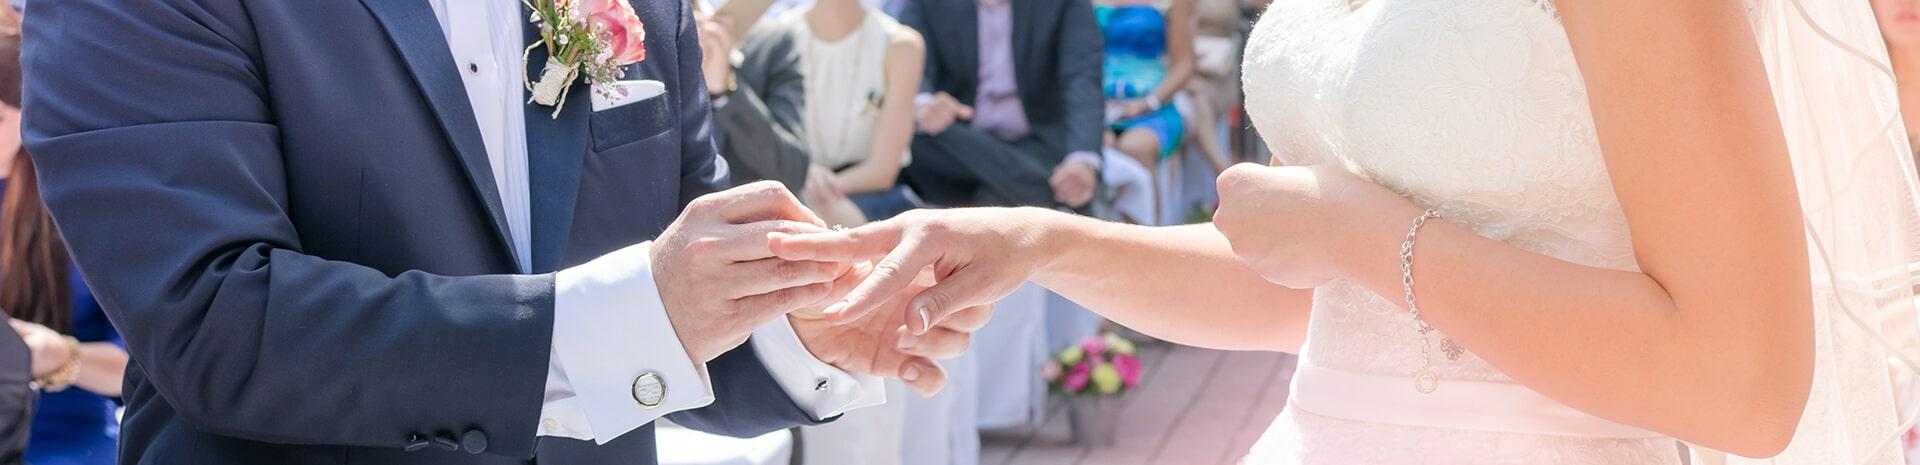 Headerbild Hochzeitsfotografie - Stephan-Benz.de